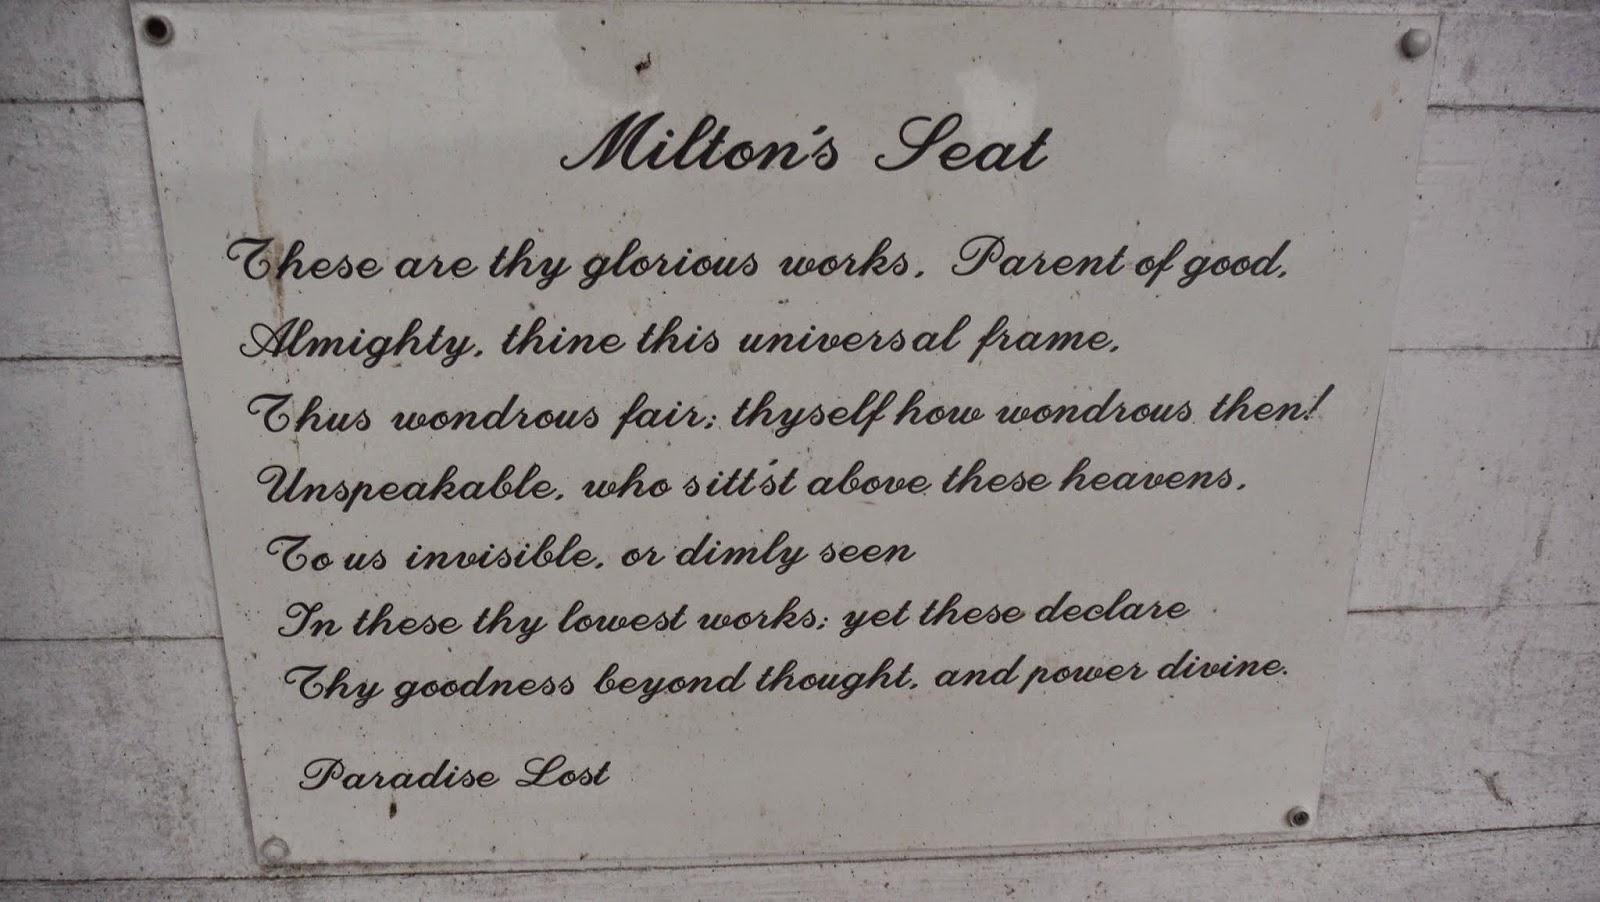 Miltons+Seat_Hagley+Hall